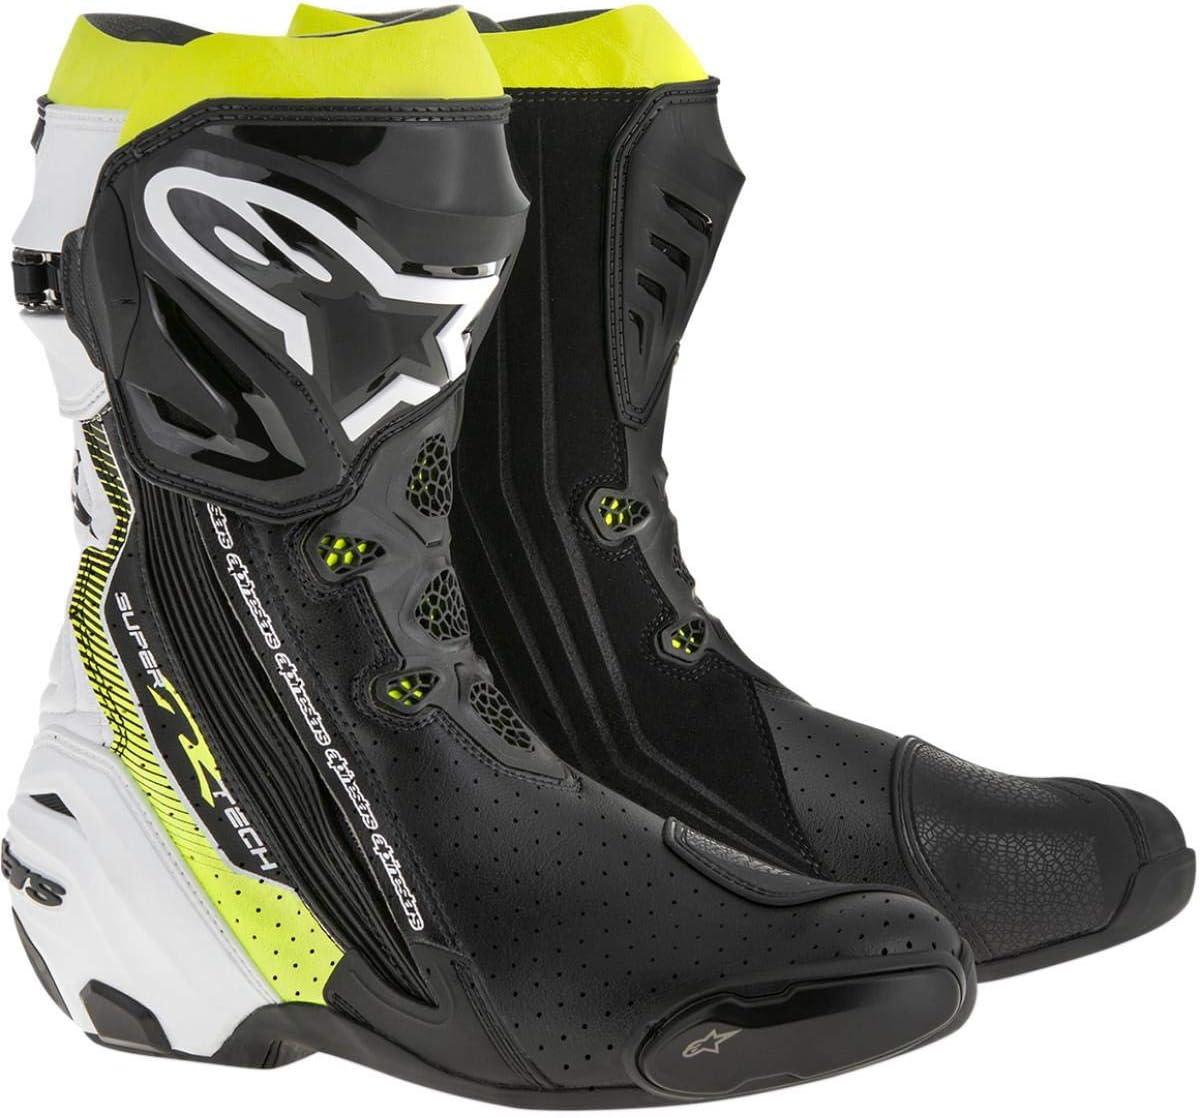 Alpinestars Supertech R Mens Motorcycle Road Racing Boots Black//White//Fluorescent Yellow, EU Size 48